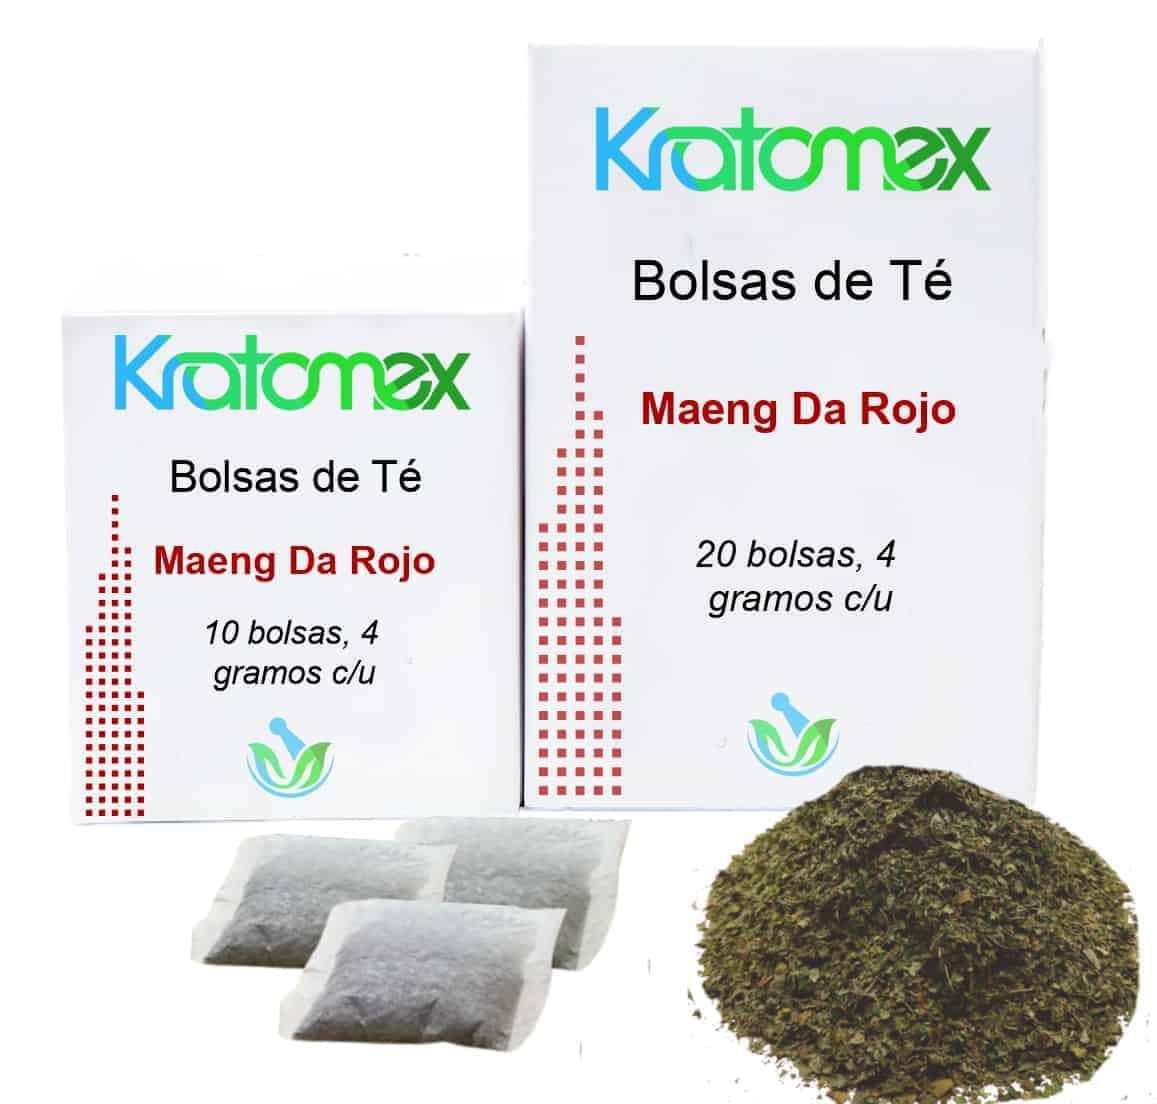 Cajas de Bolsas de Té de Maeng Da Rojo Kratom y hojas de Maeng Da Rojo Kratom